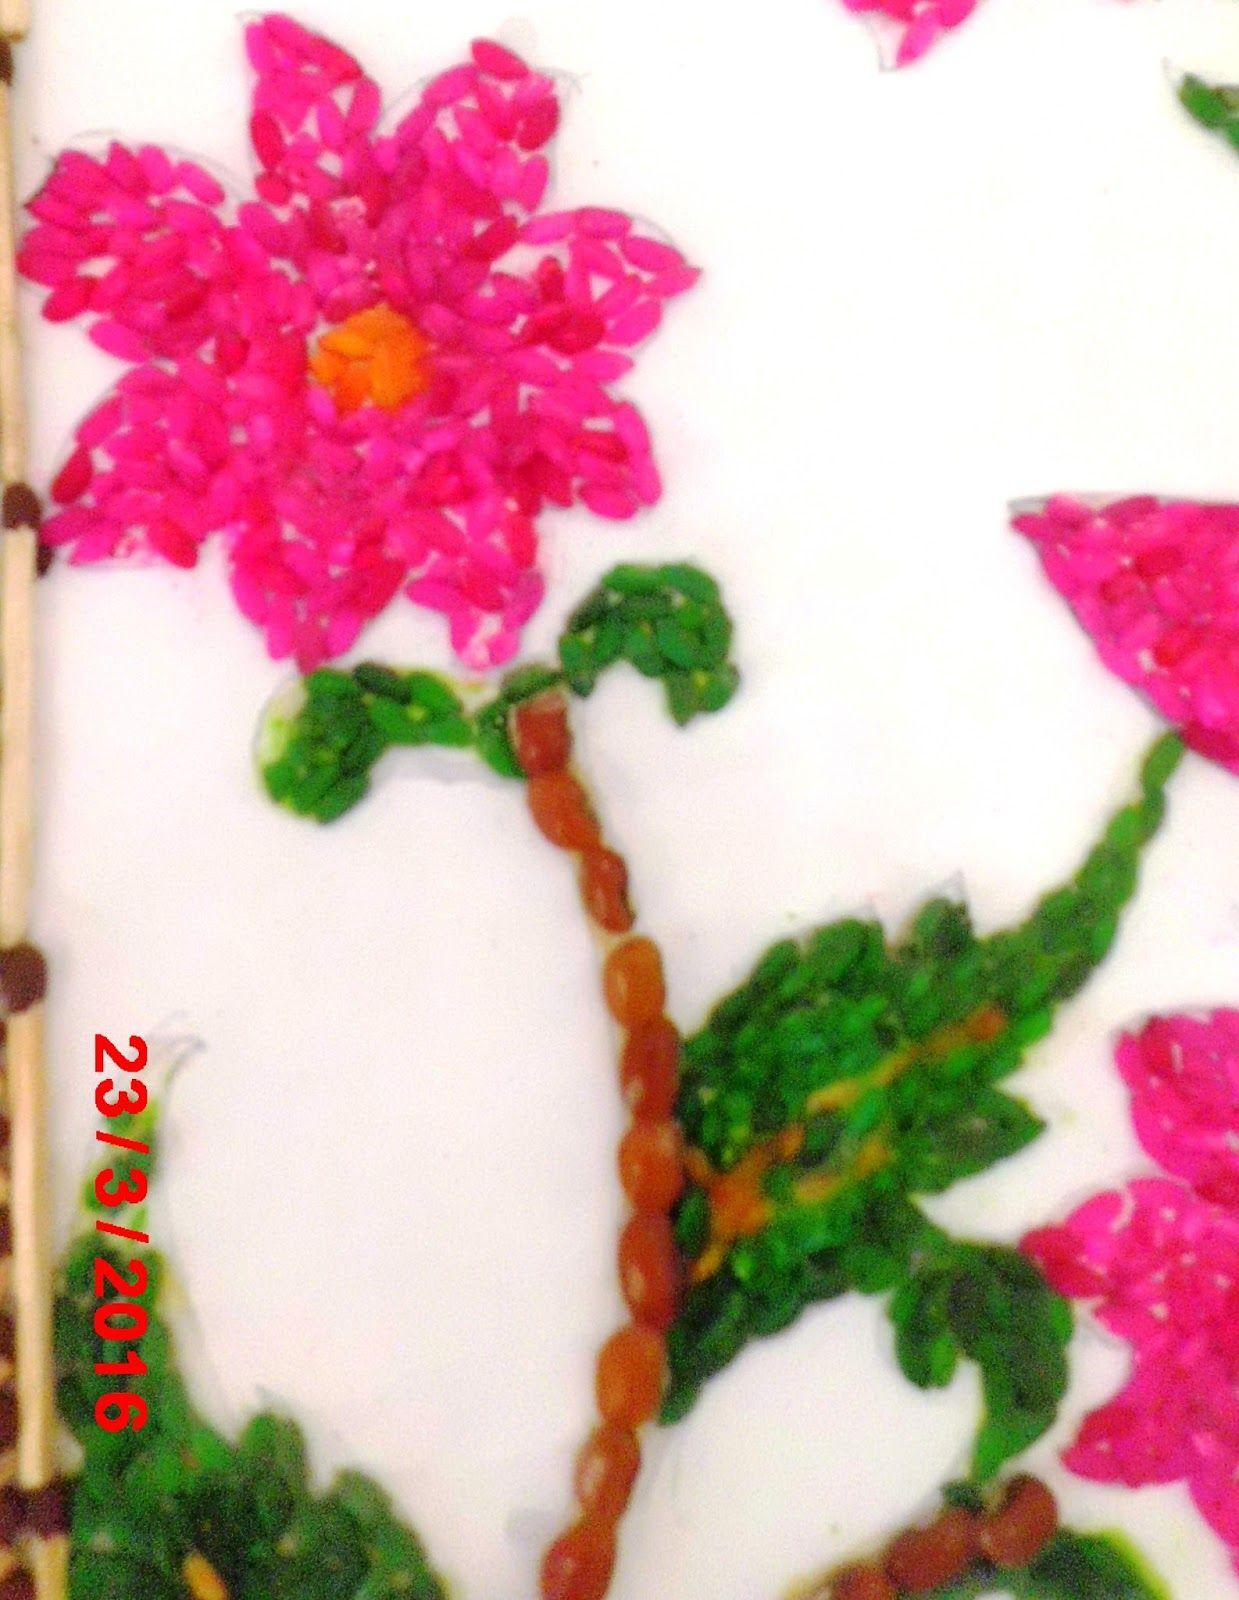 870 Contoh Gambar Kolase Dari Padi Terbaik Kolase Biji Bunga Matahari Gambar